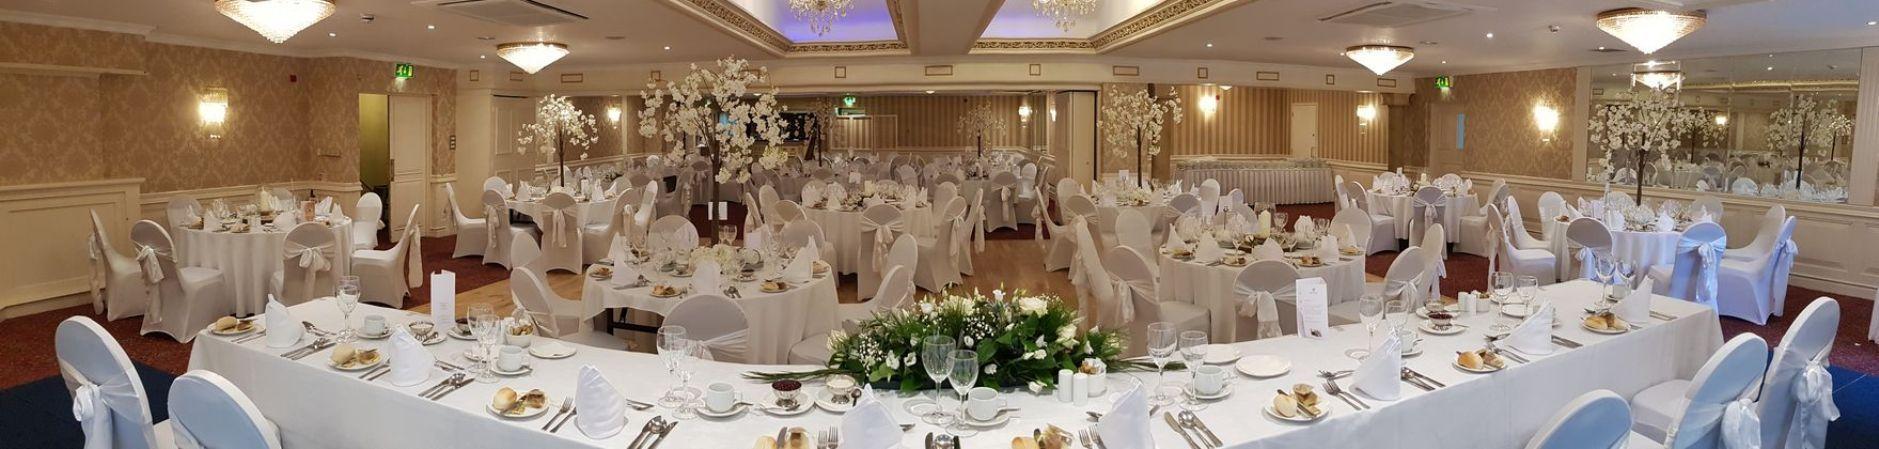 Wedding Venue Bushtown Hotel Coleraine Londonderry